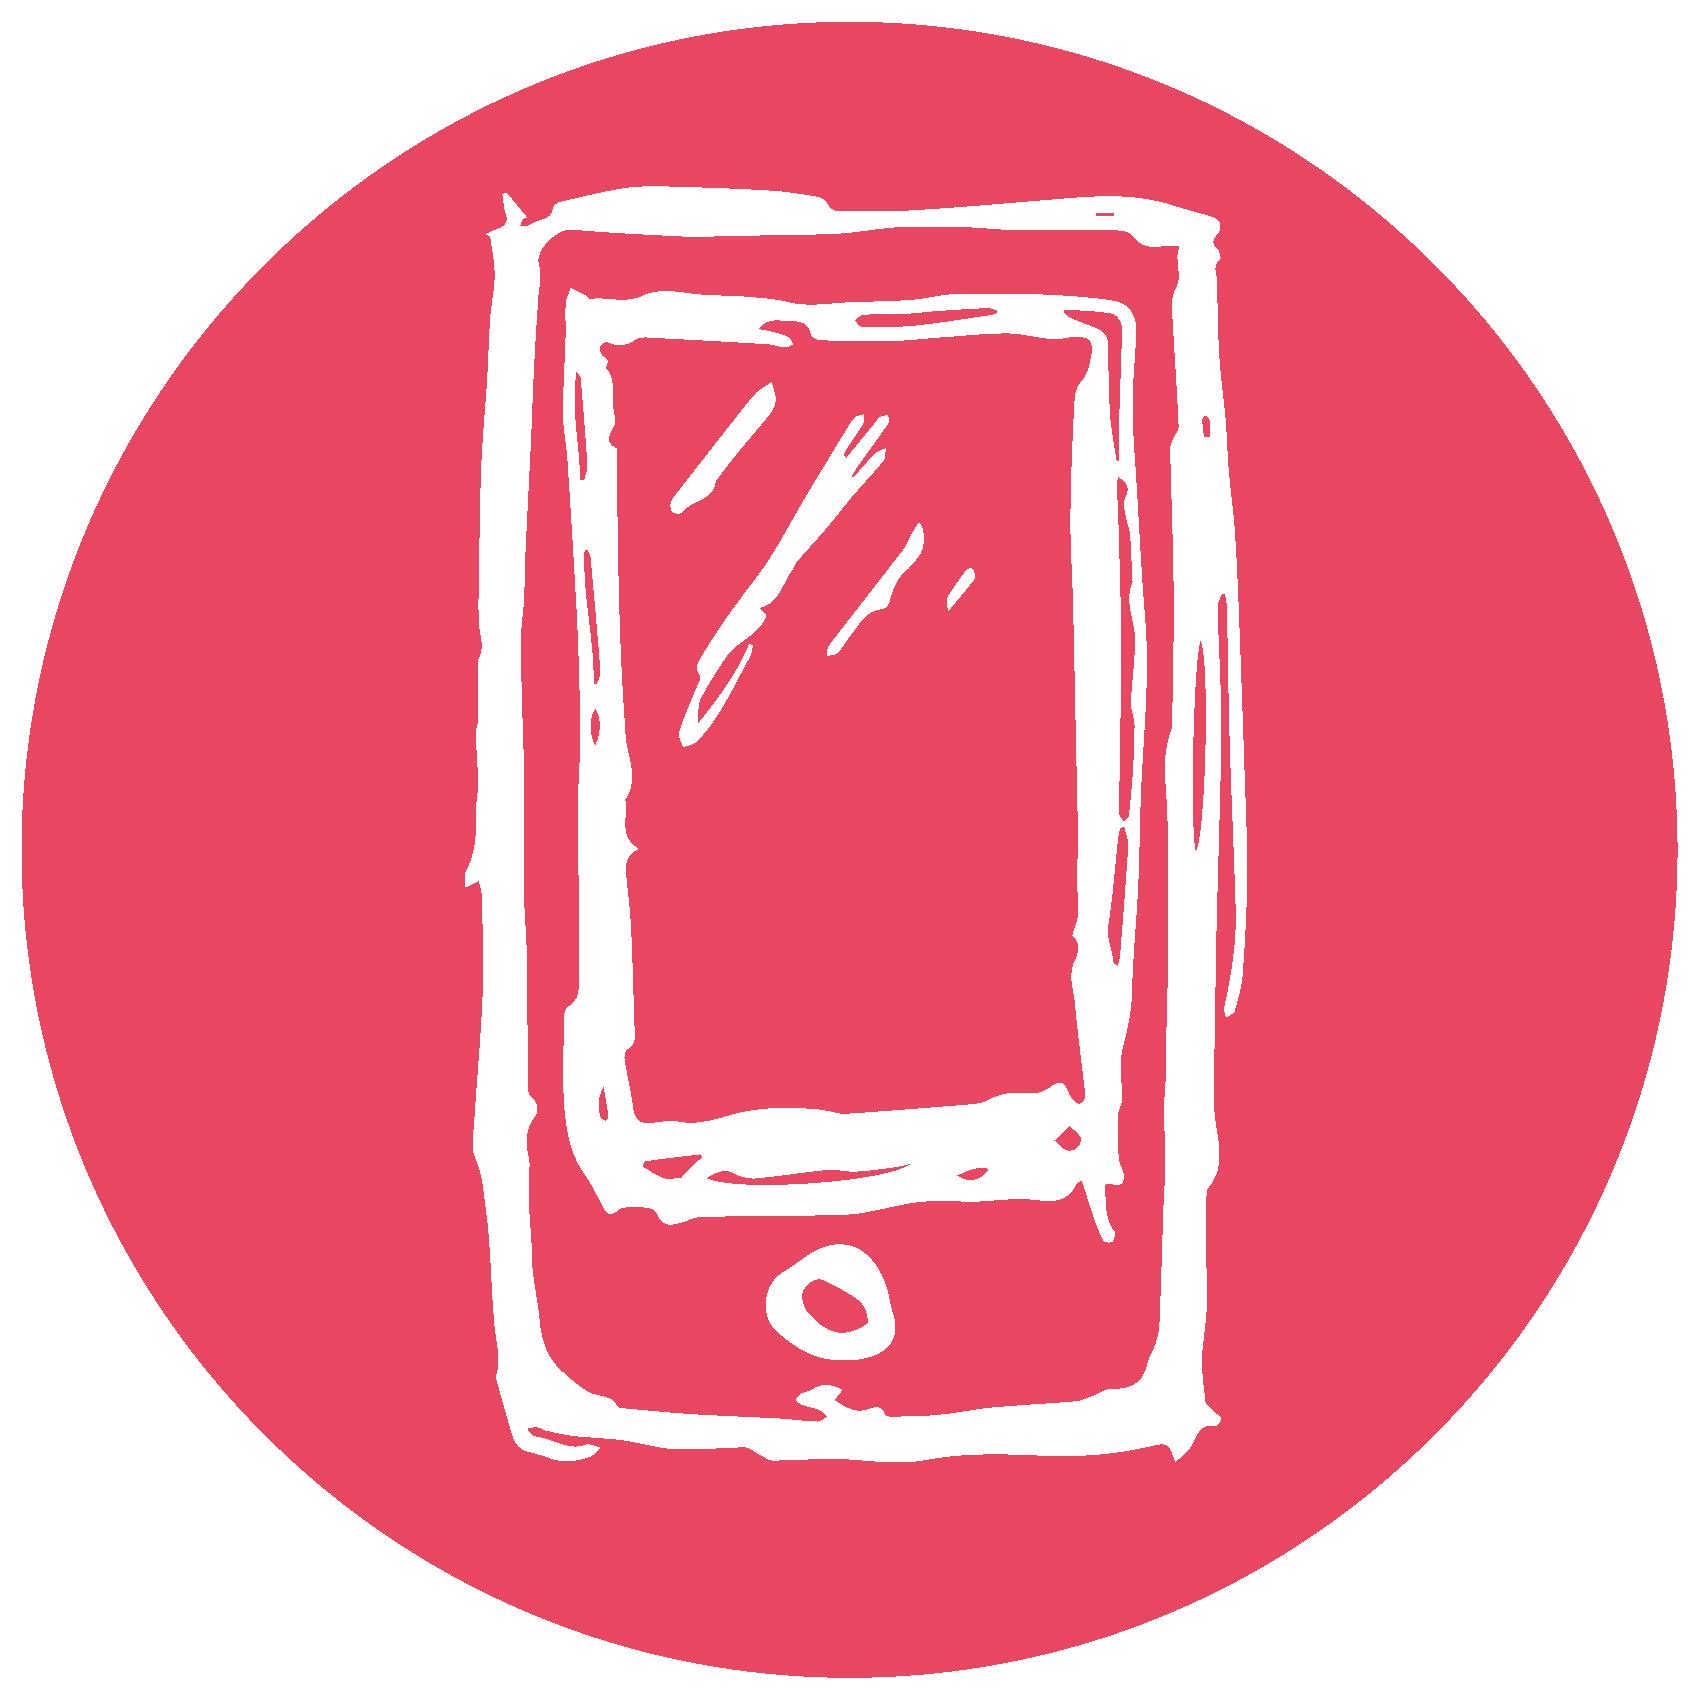 Schokocards Phone Kontakt